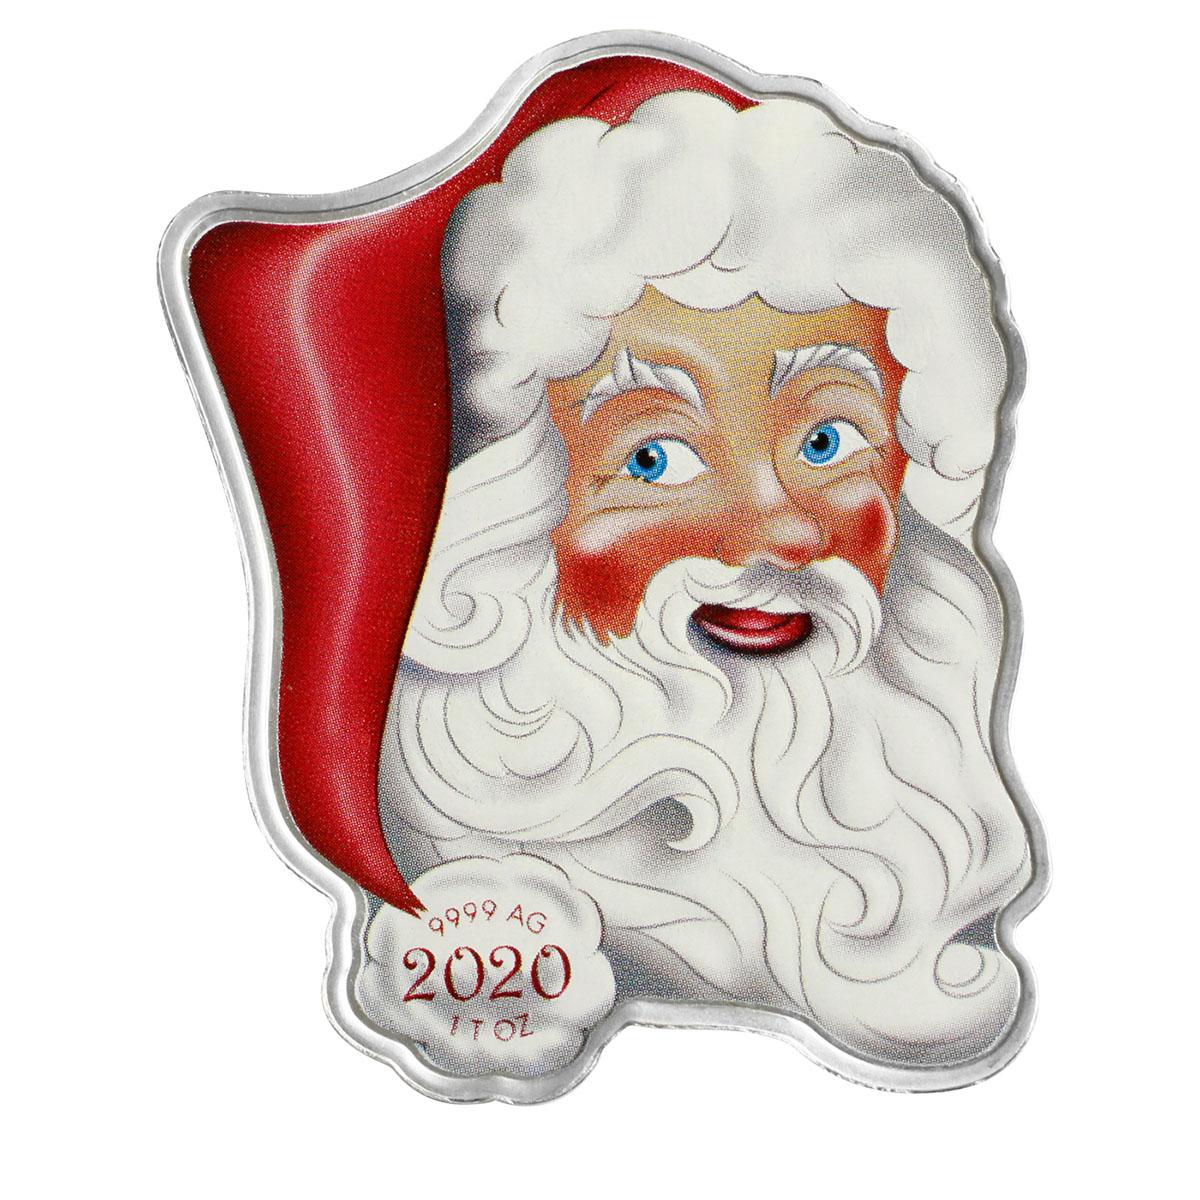 2020 Pamp Holiday Santa 1oz Silver Coin - Solomon Islands